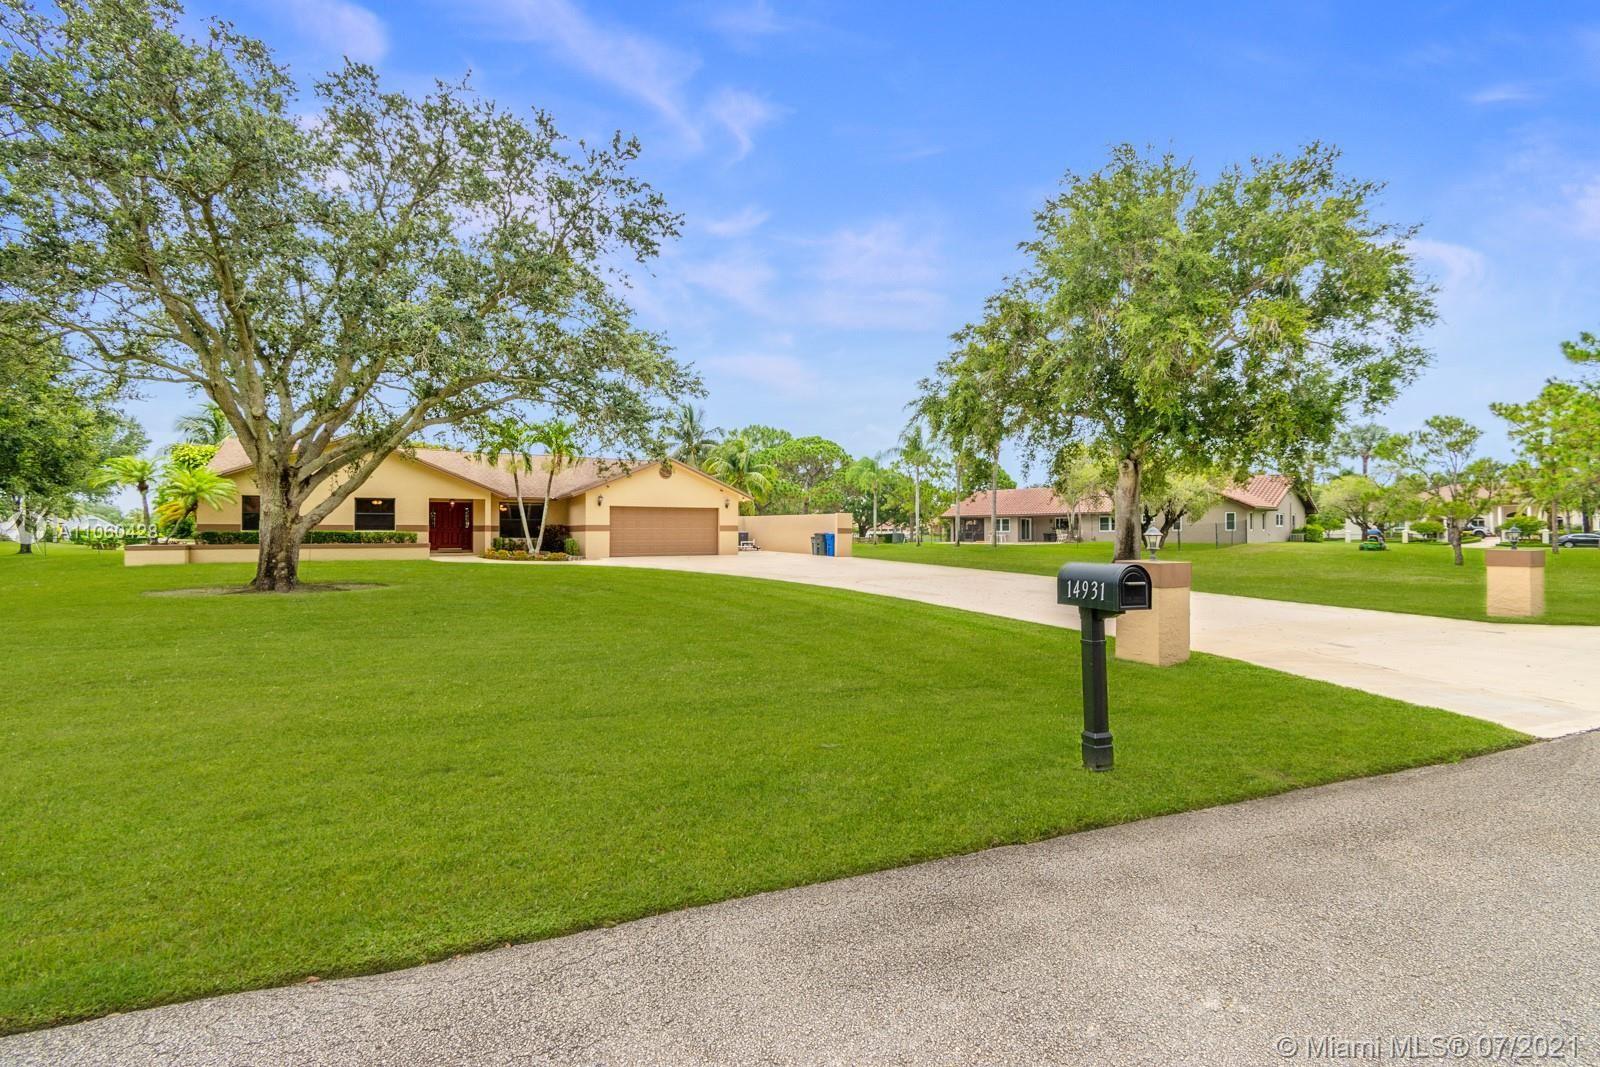 14931 Foxheath Dr, SouthWest Ranches, FL 33331 - #: A11060428